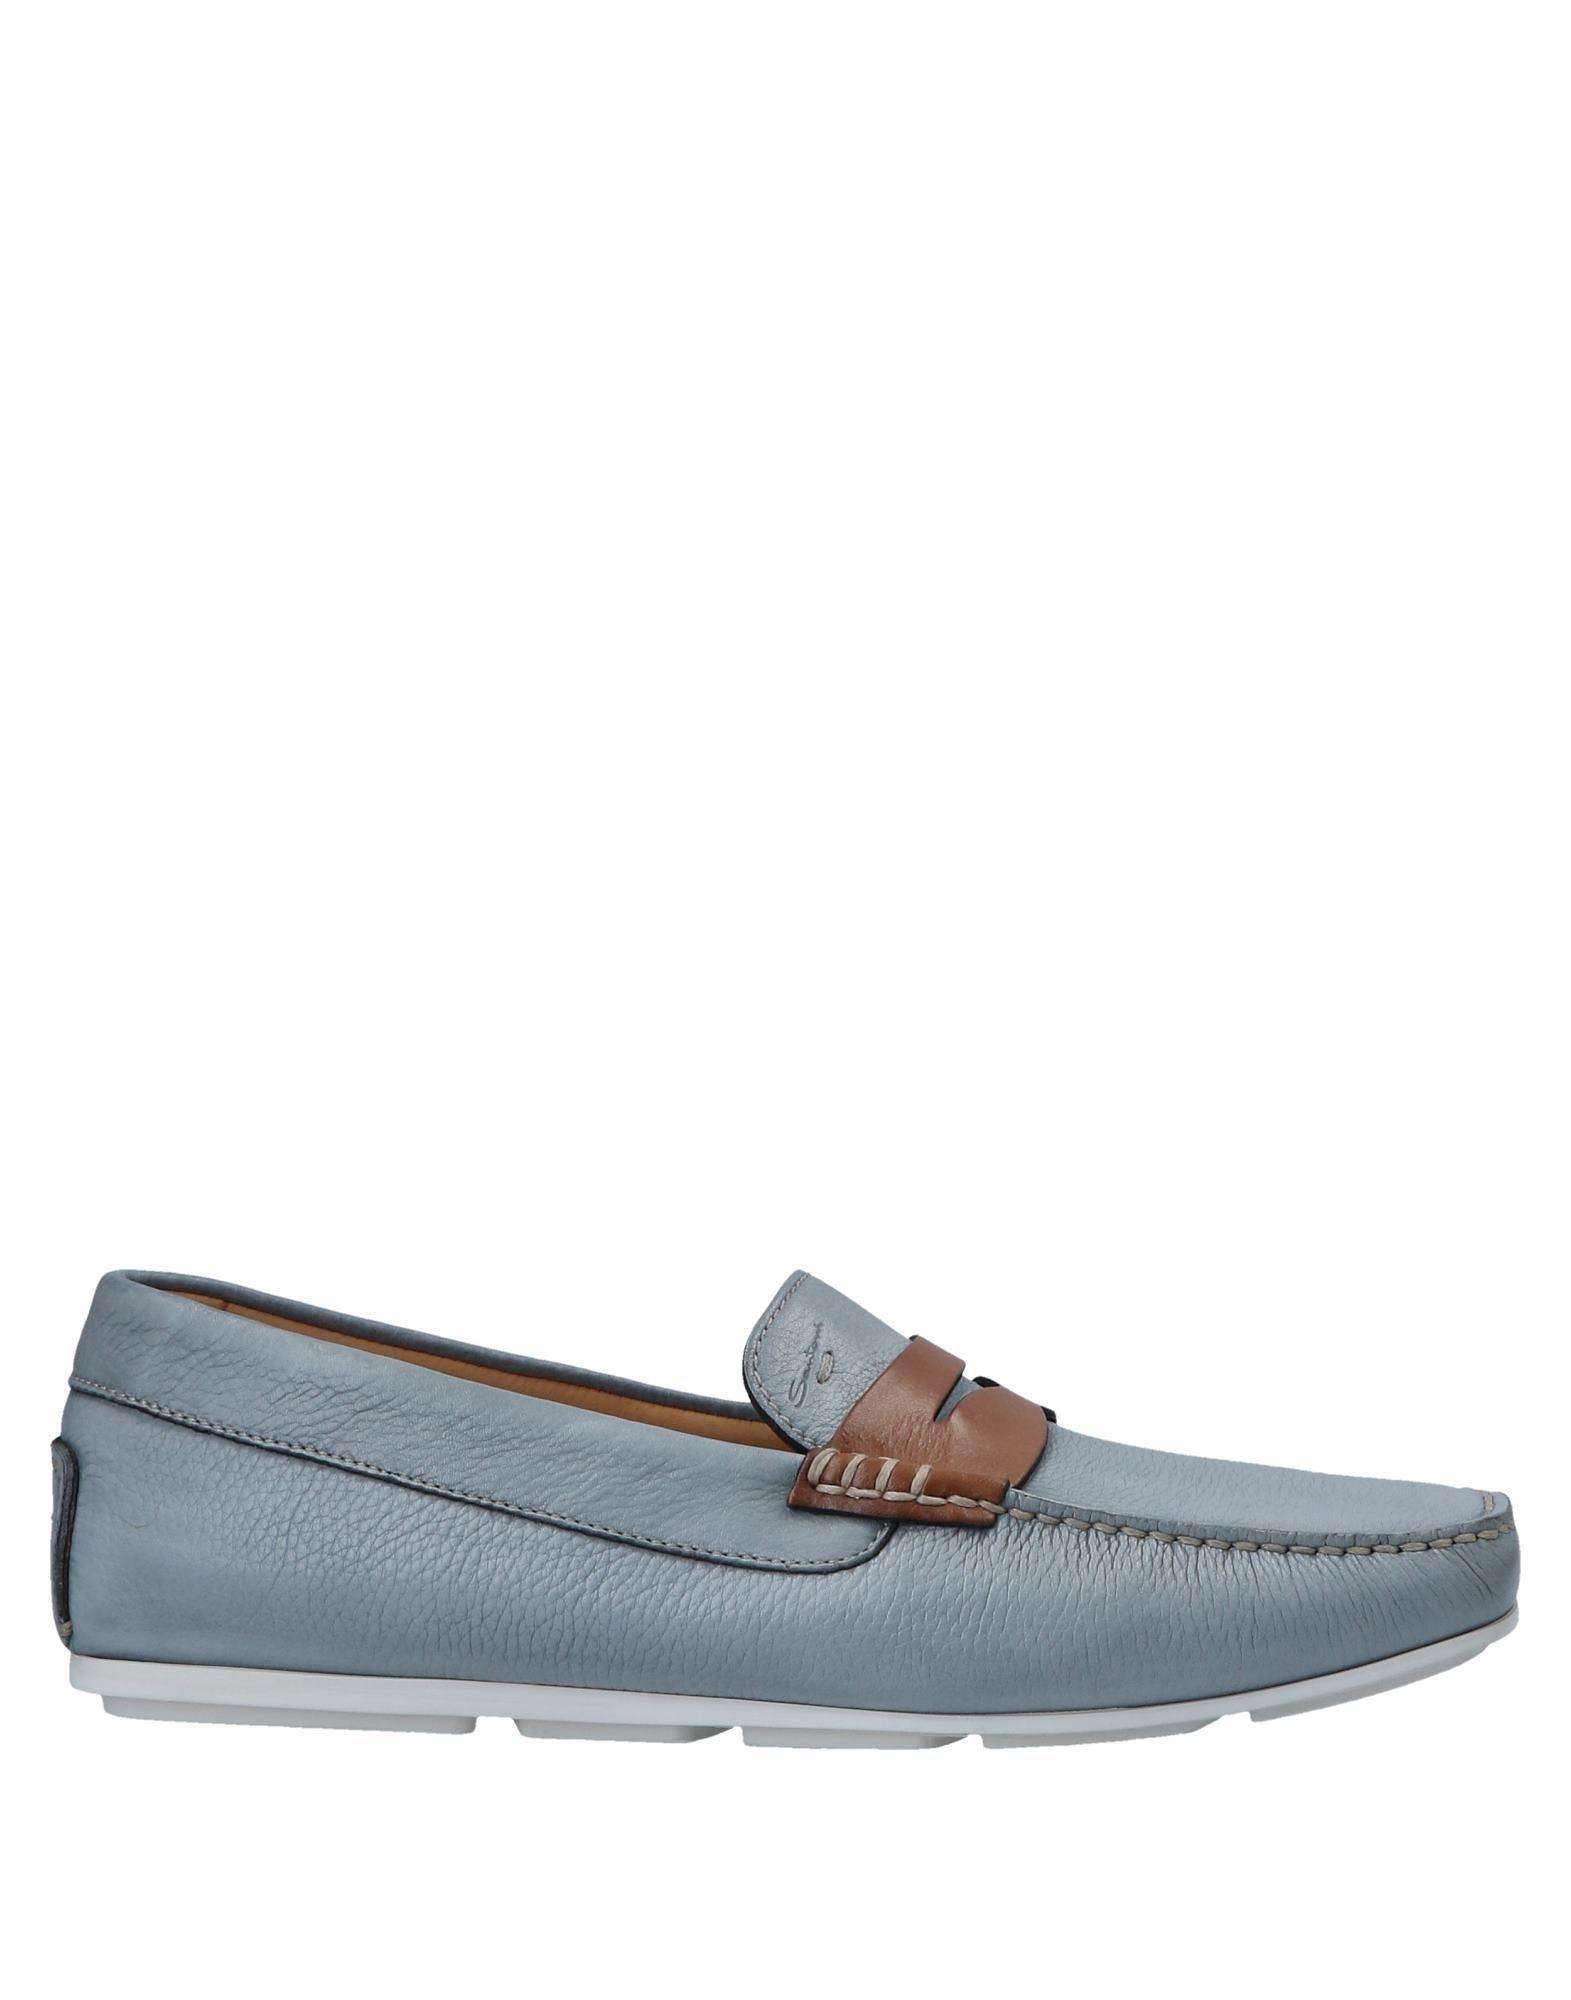 Santoni 11555986QX Mokassins Herren  11555986QX Santoni Gute Qualität beliebte Schuhe f1ba93